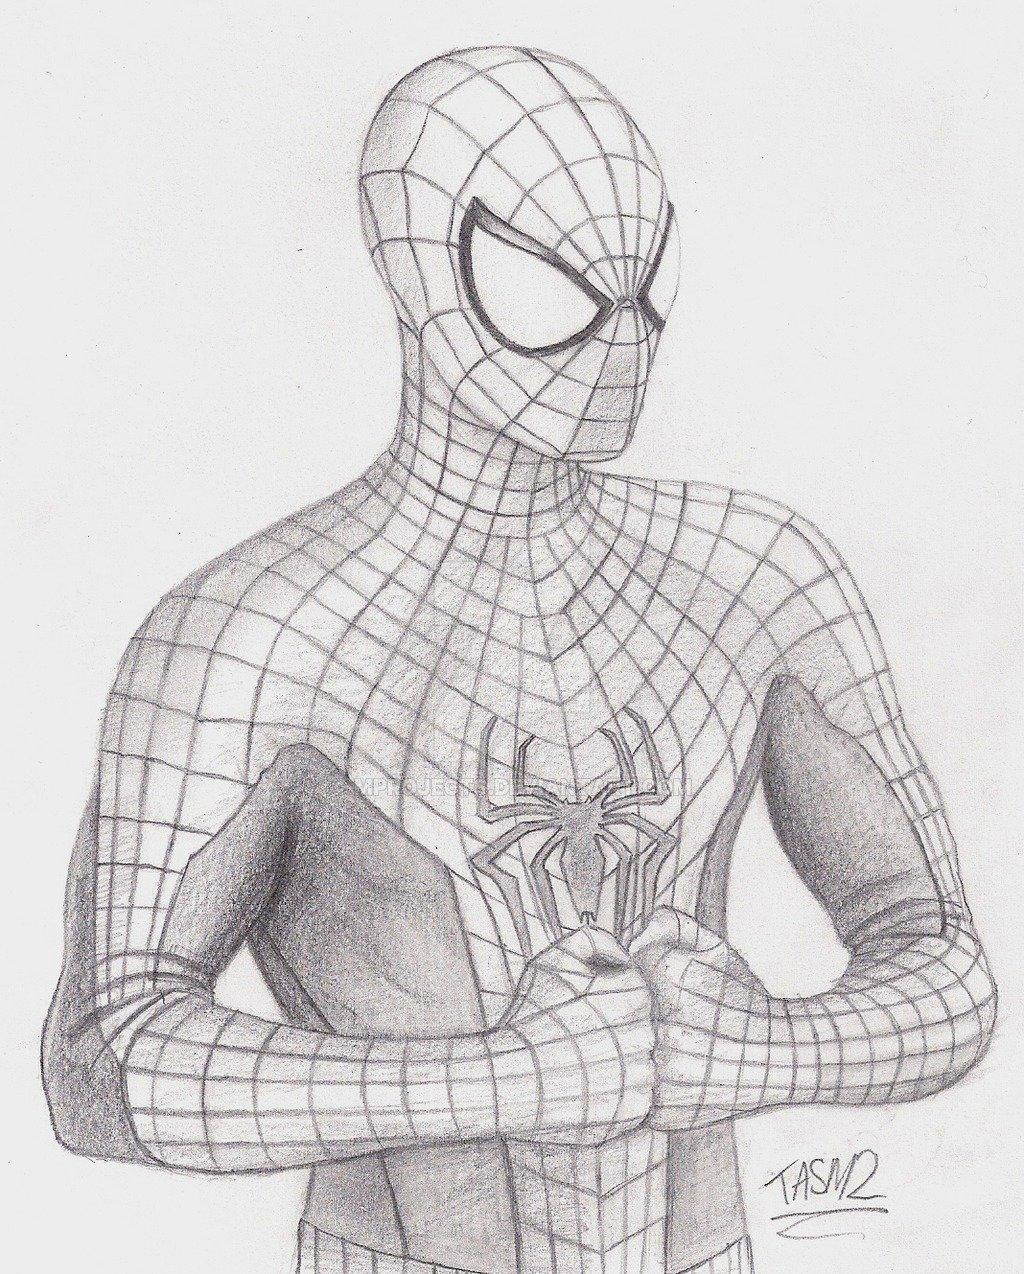 они лицо человека паука картинки нарисовать ишлаб чи?арилган машиналарни